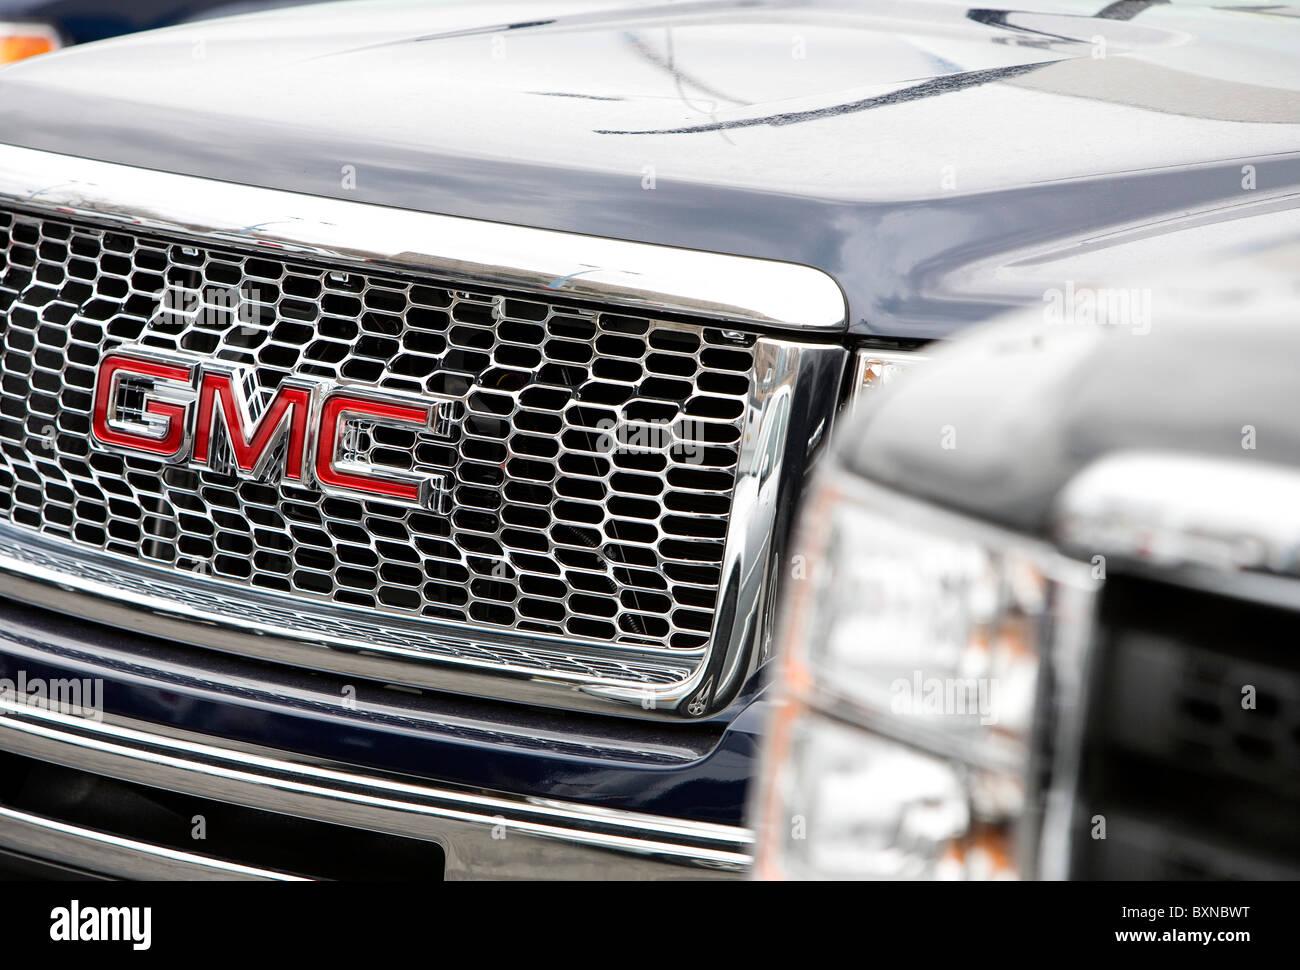 General Motors Dealer Stock Photos & General Motors Dealer Stock Images - Alamy